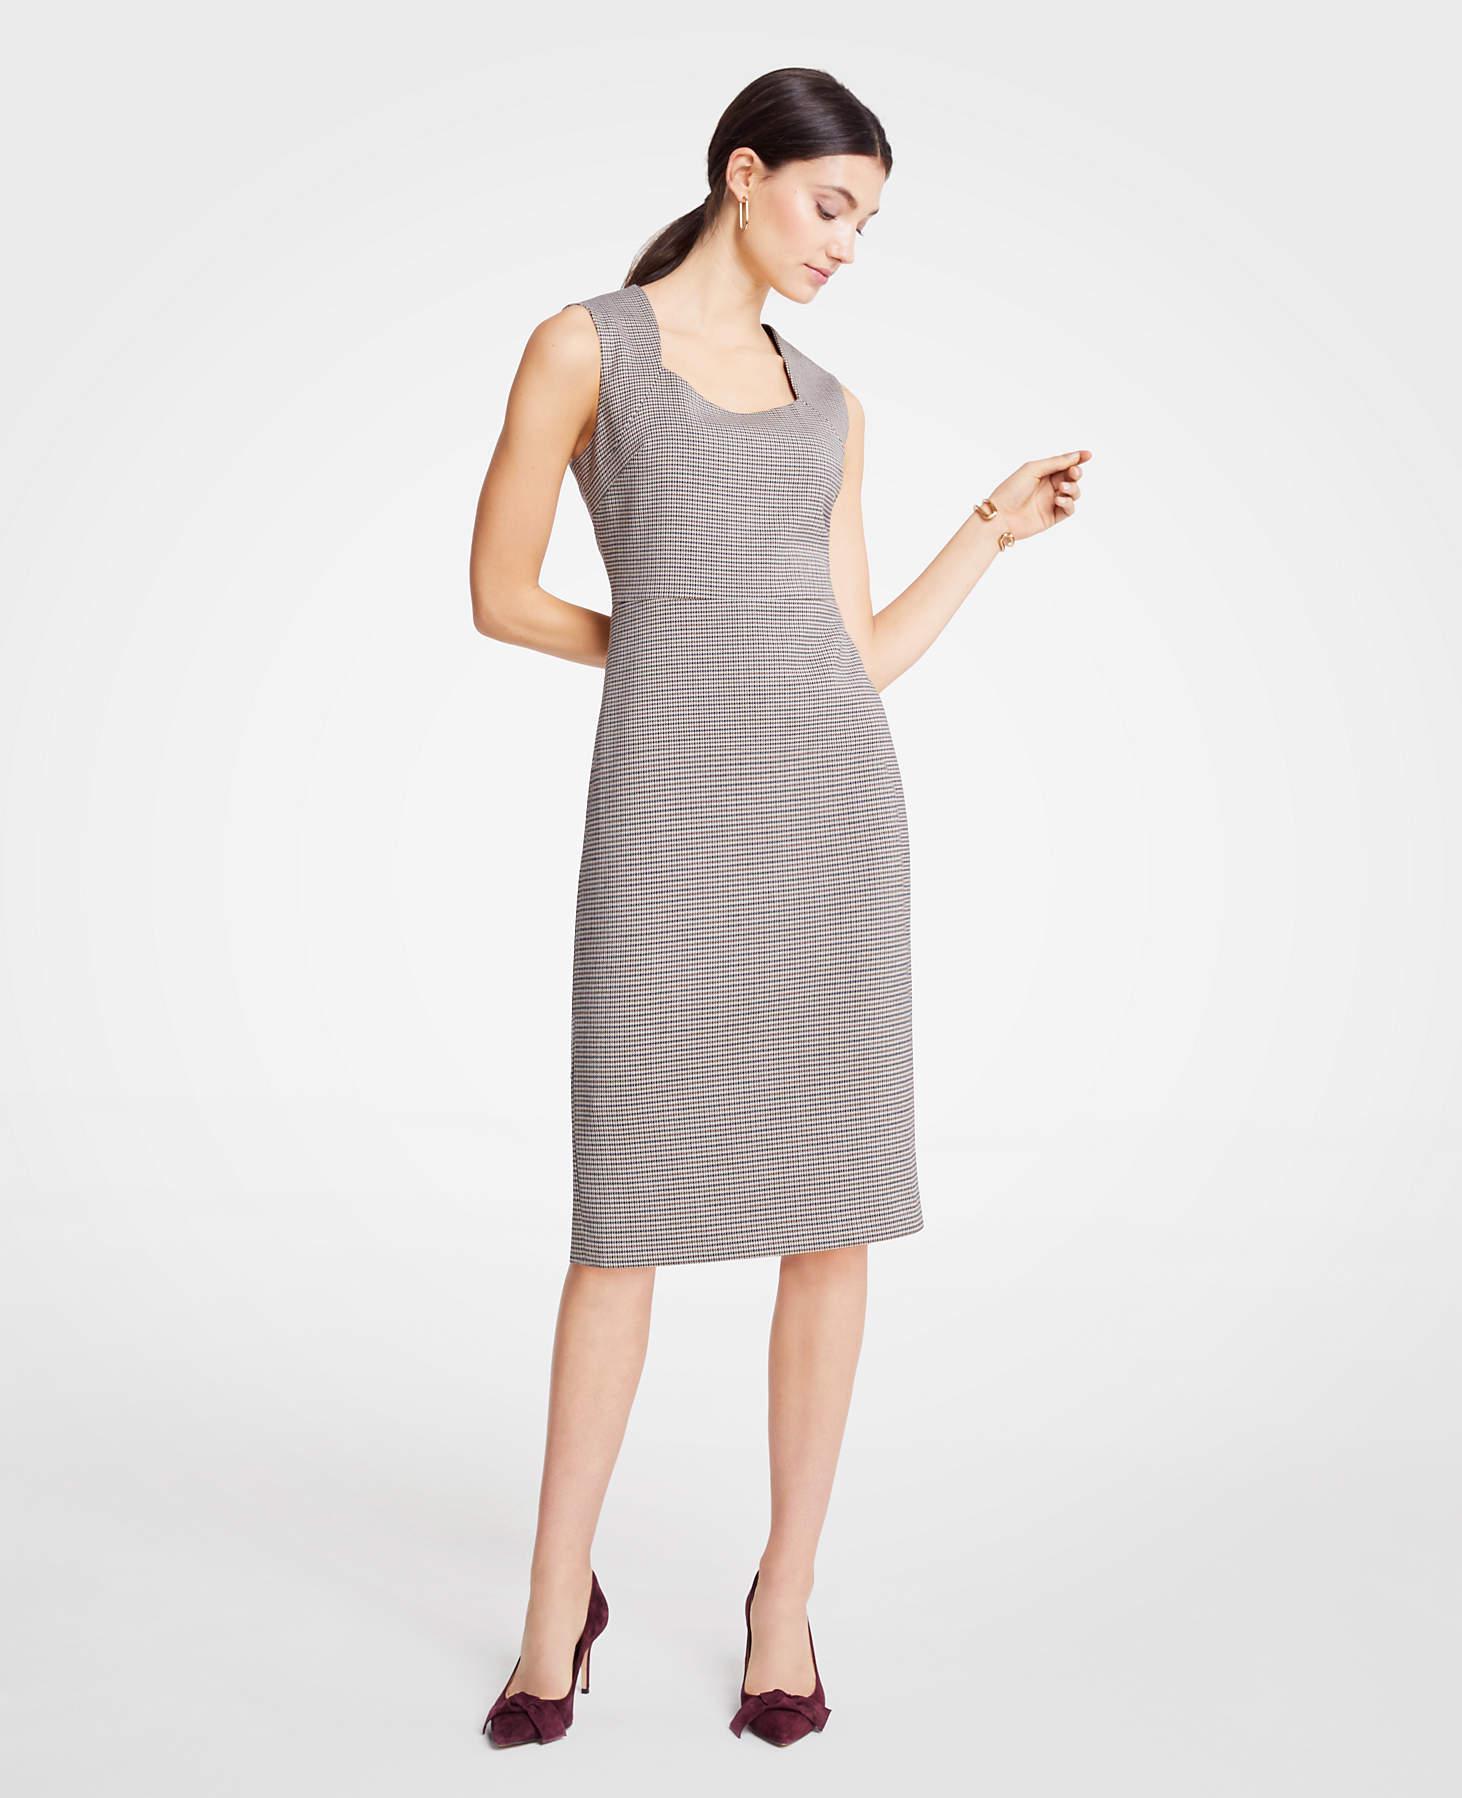 acb6f0fa355 Lyst - Ann Taylor Houndstooth Square Neck Sheath Dress